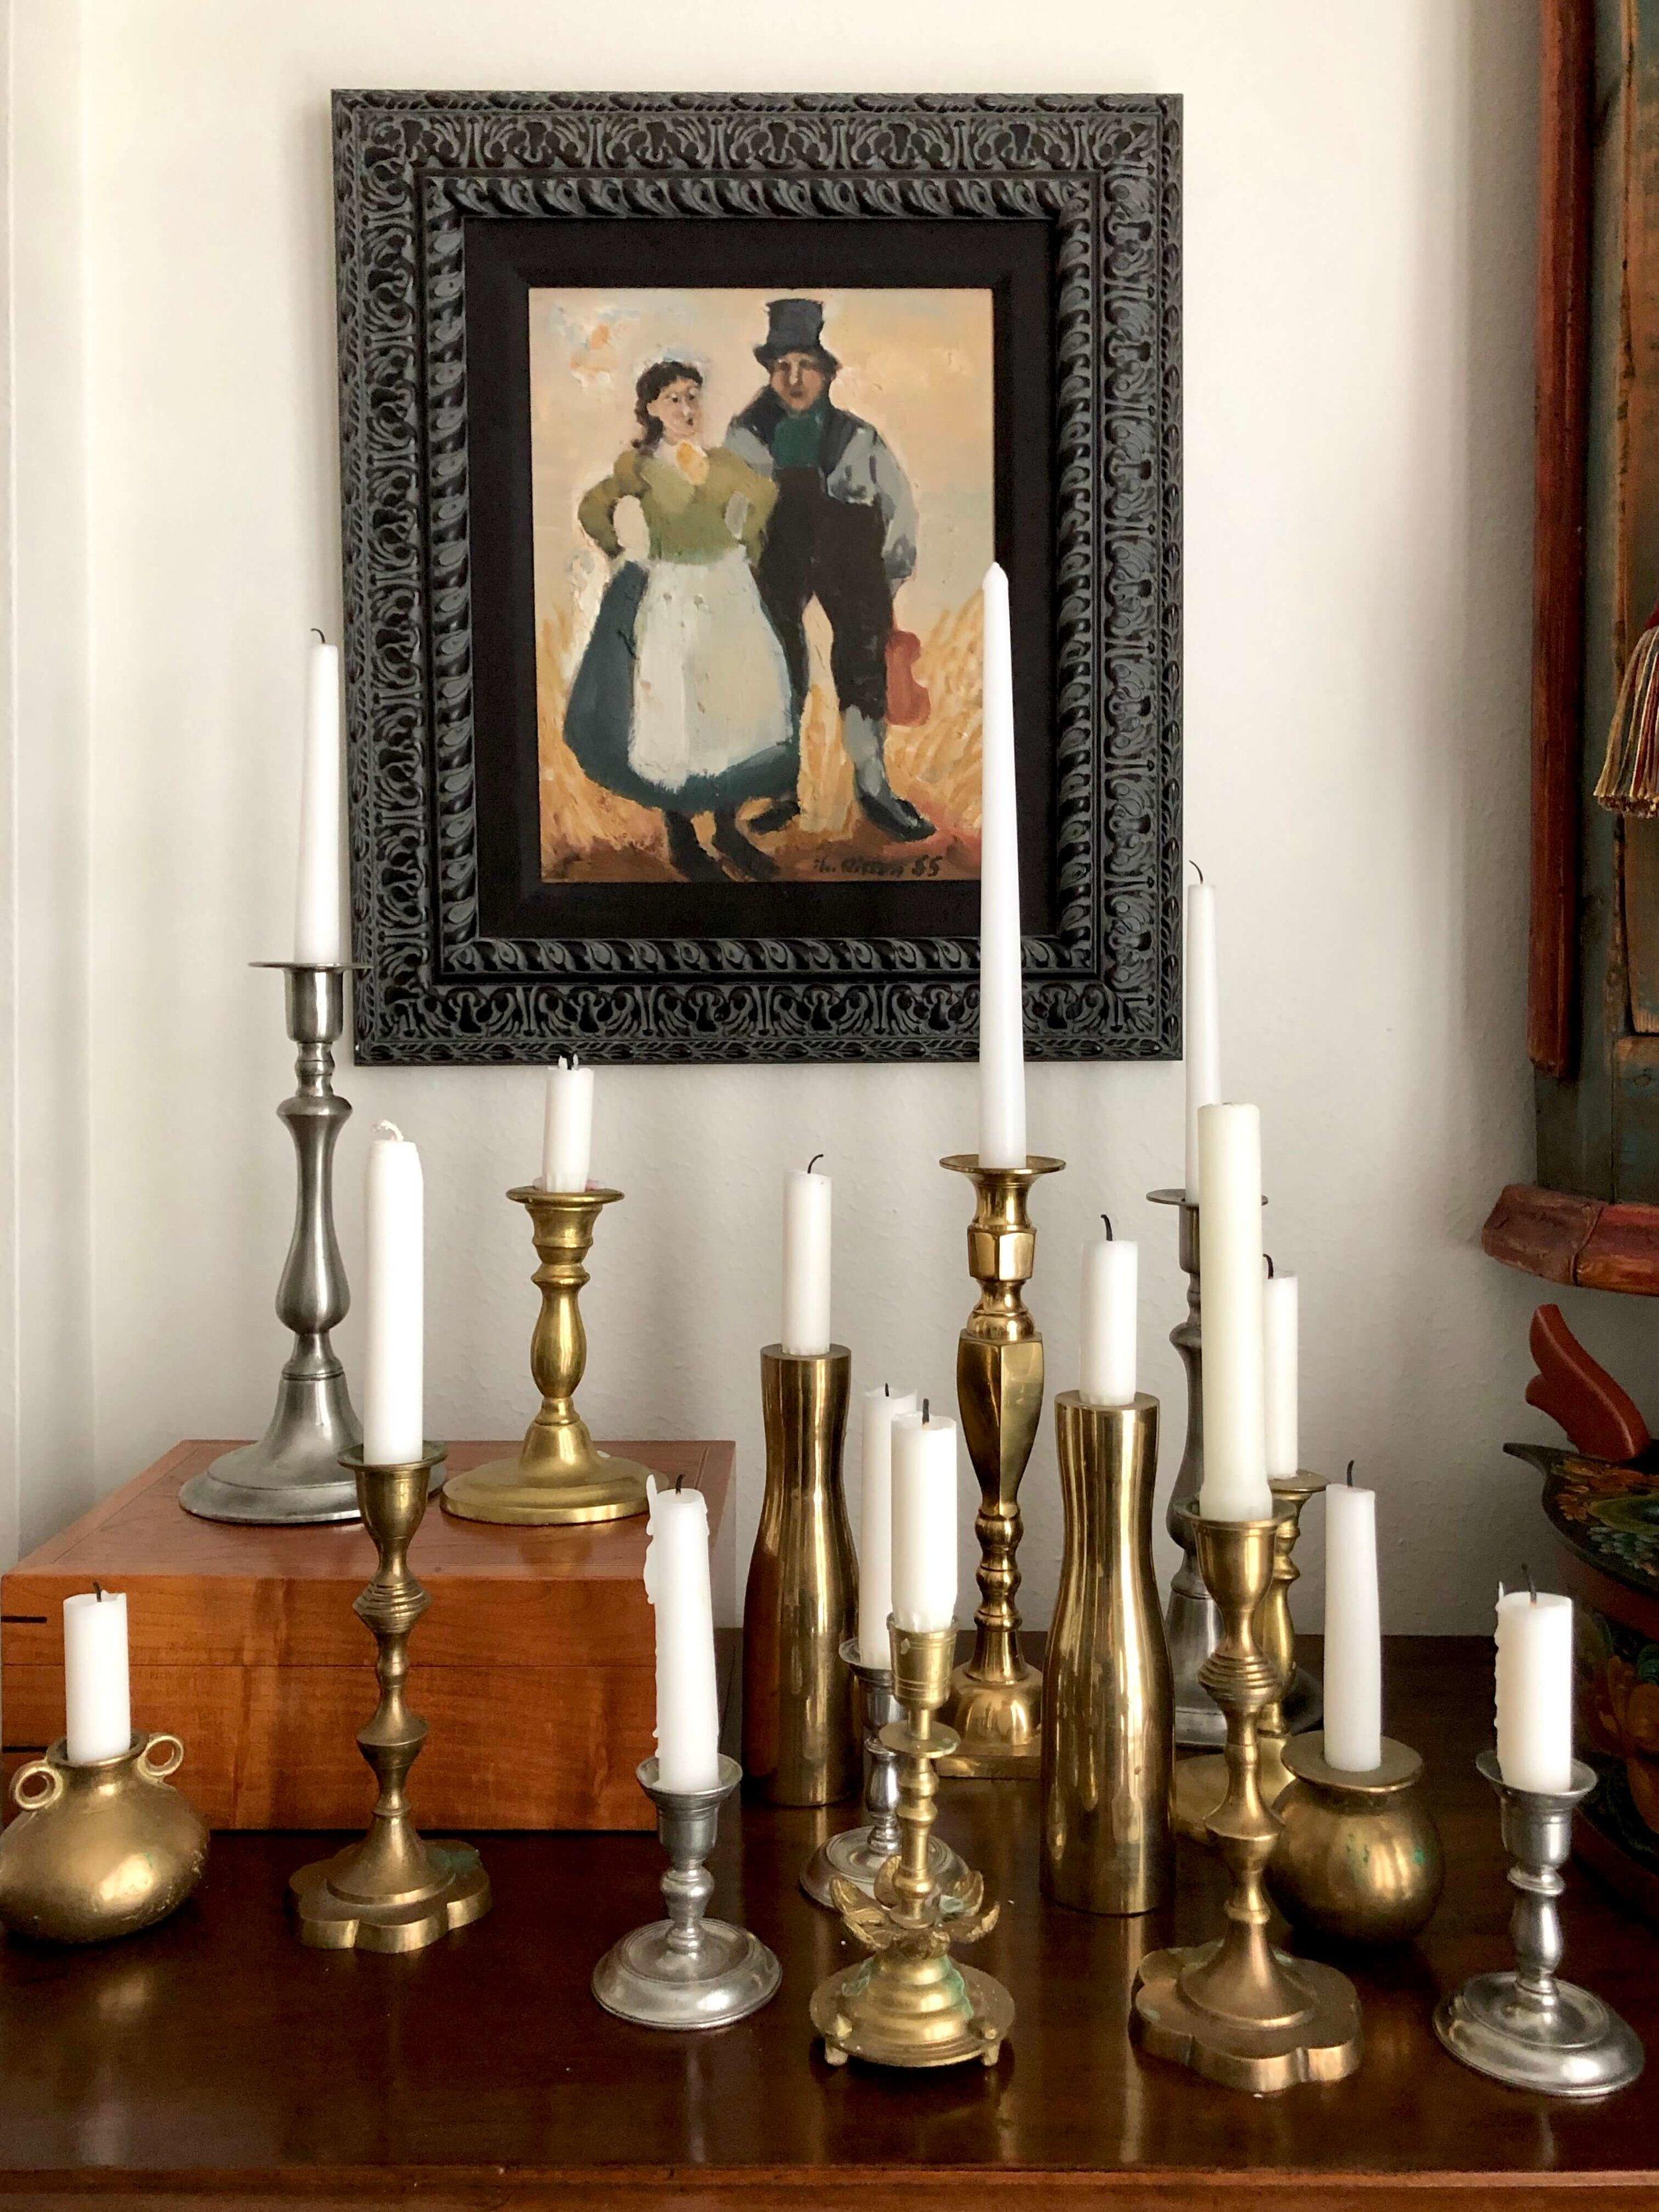 Taper candles trending in home design with brass and pewter candlesticks #tapercandles #candlesticks #interiordesigntrends #trending